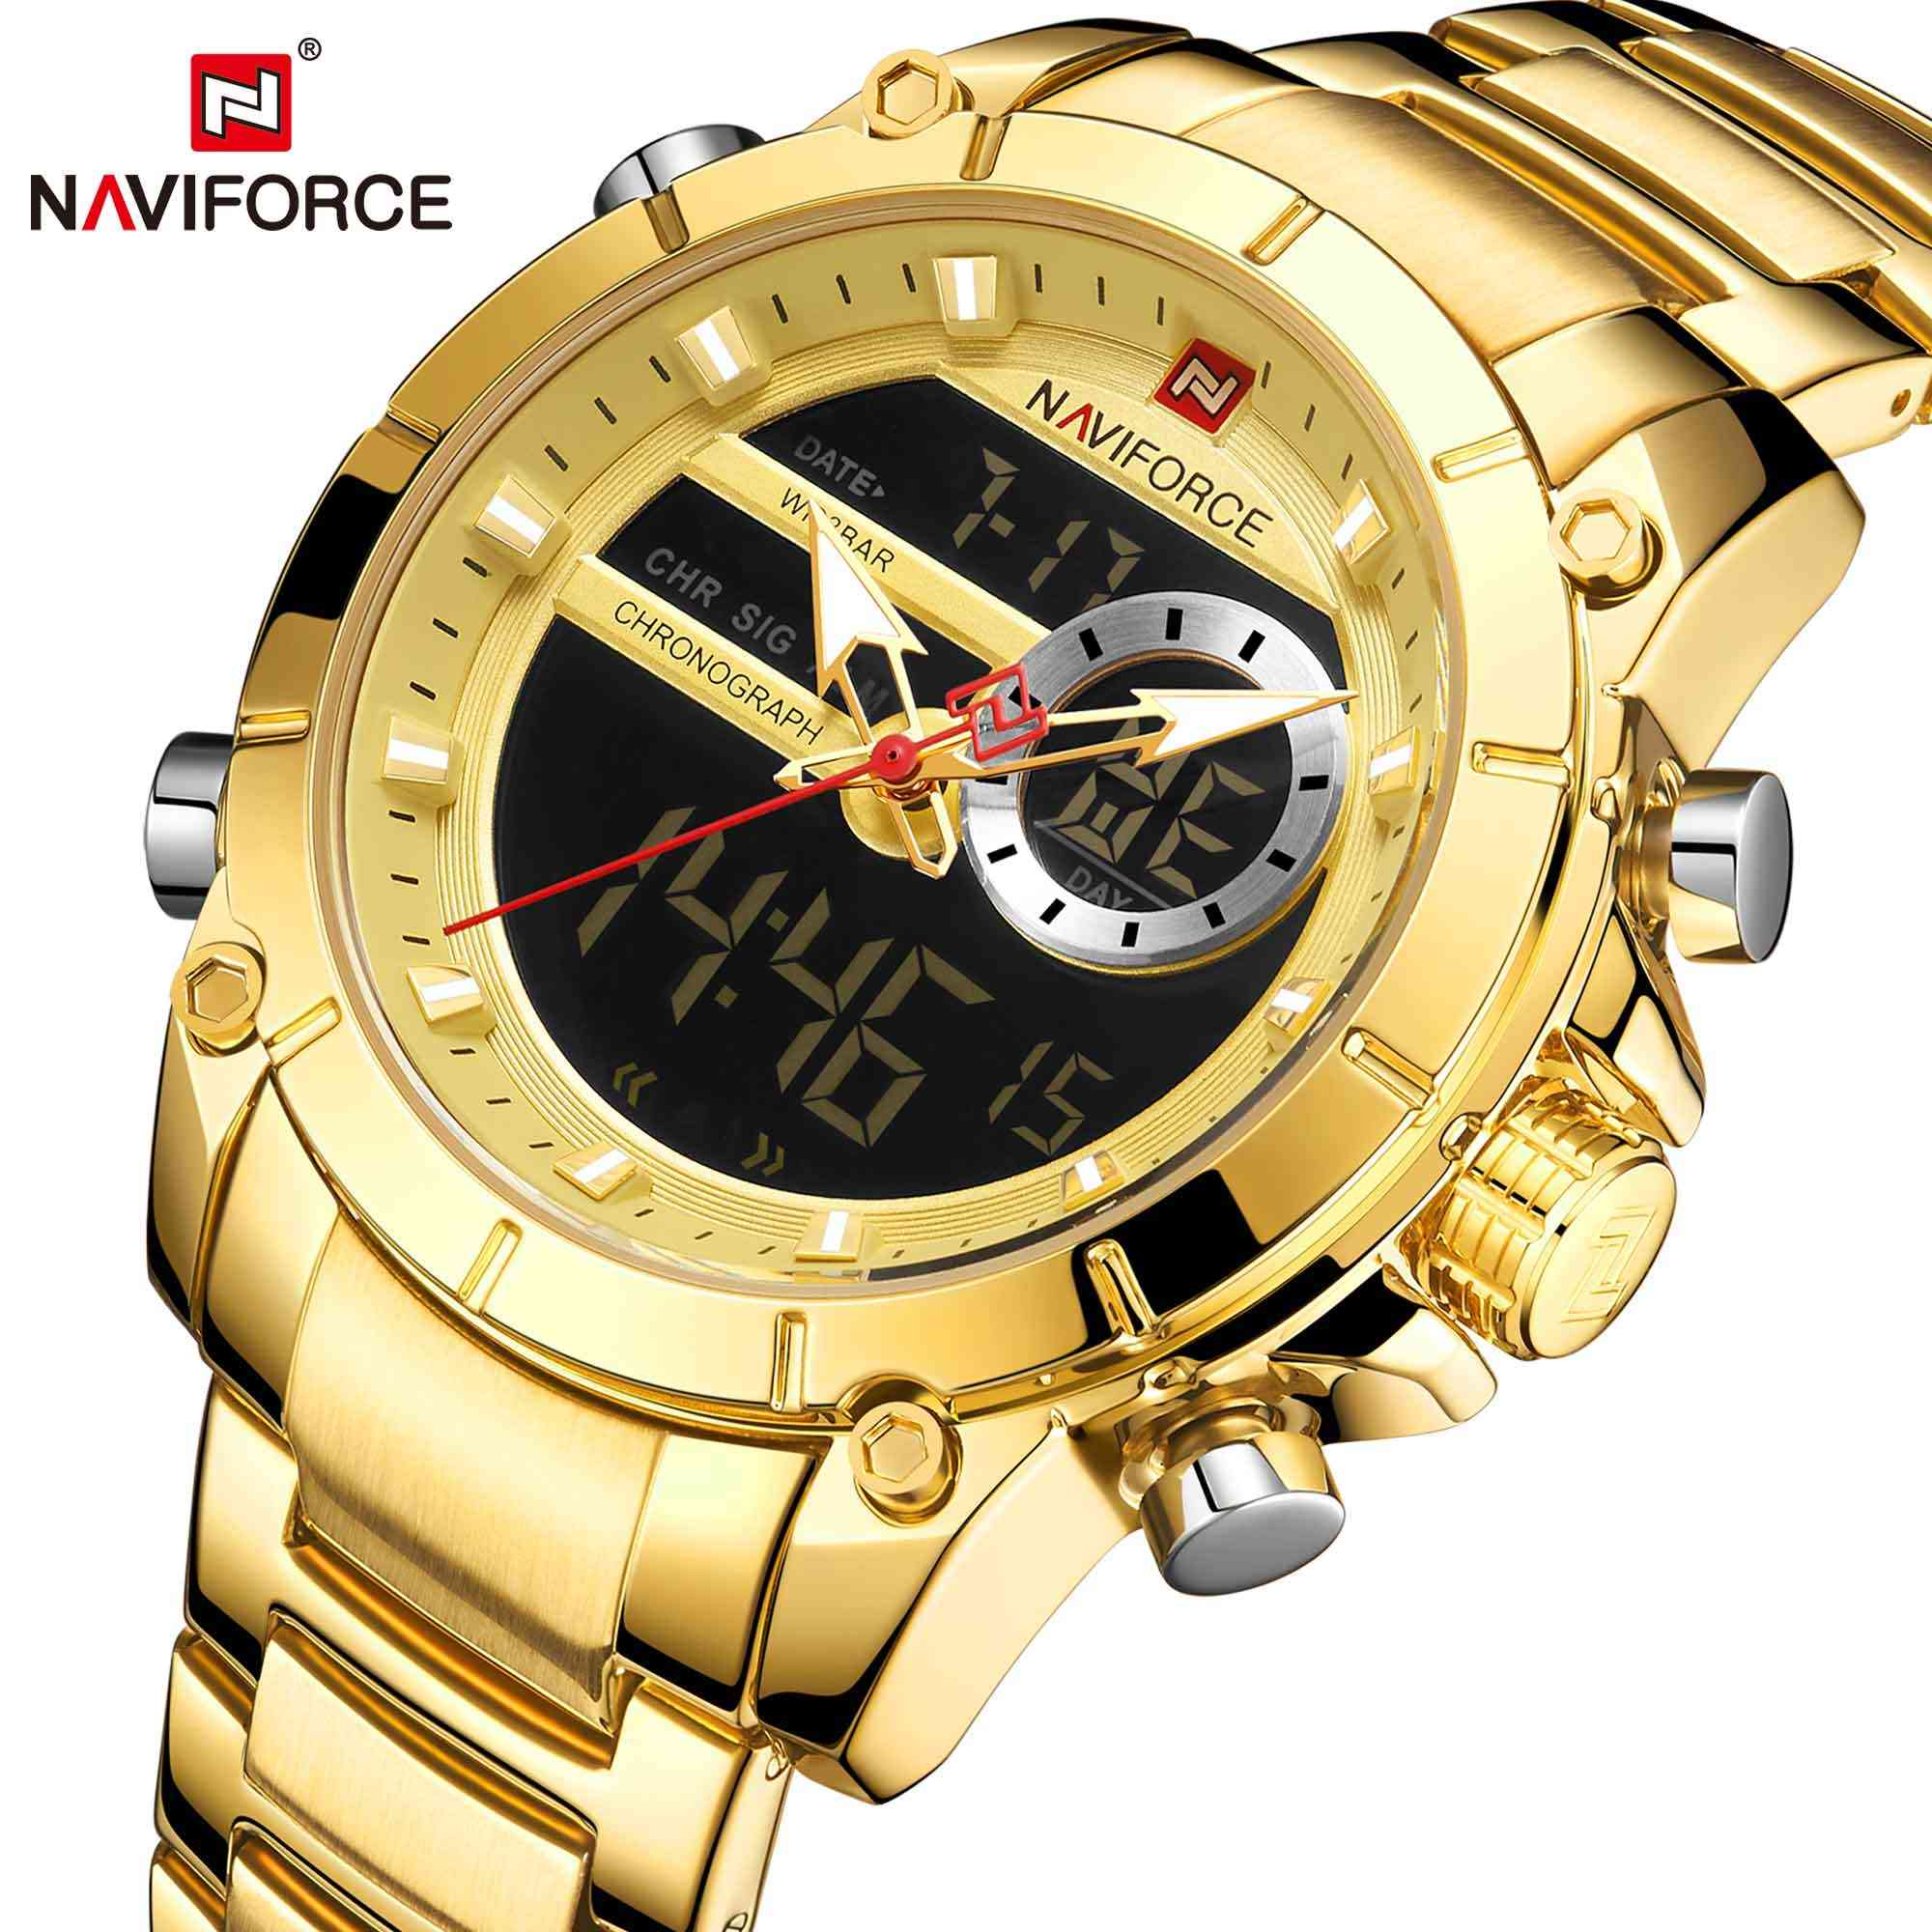 Naviforce NF9163 Men's DUAIL Watch